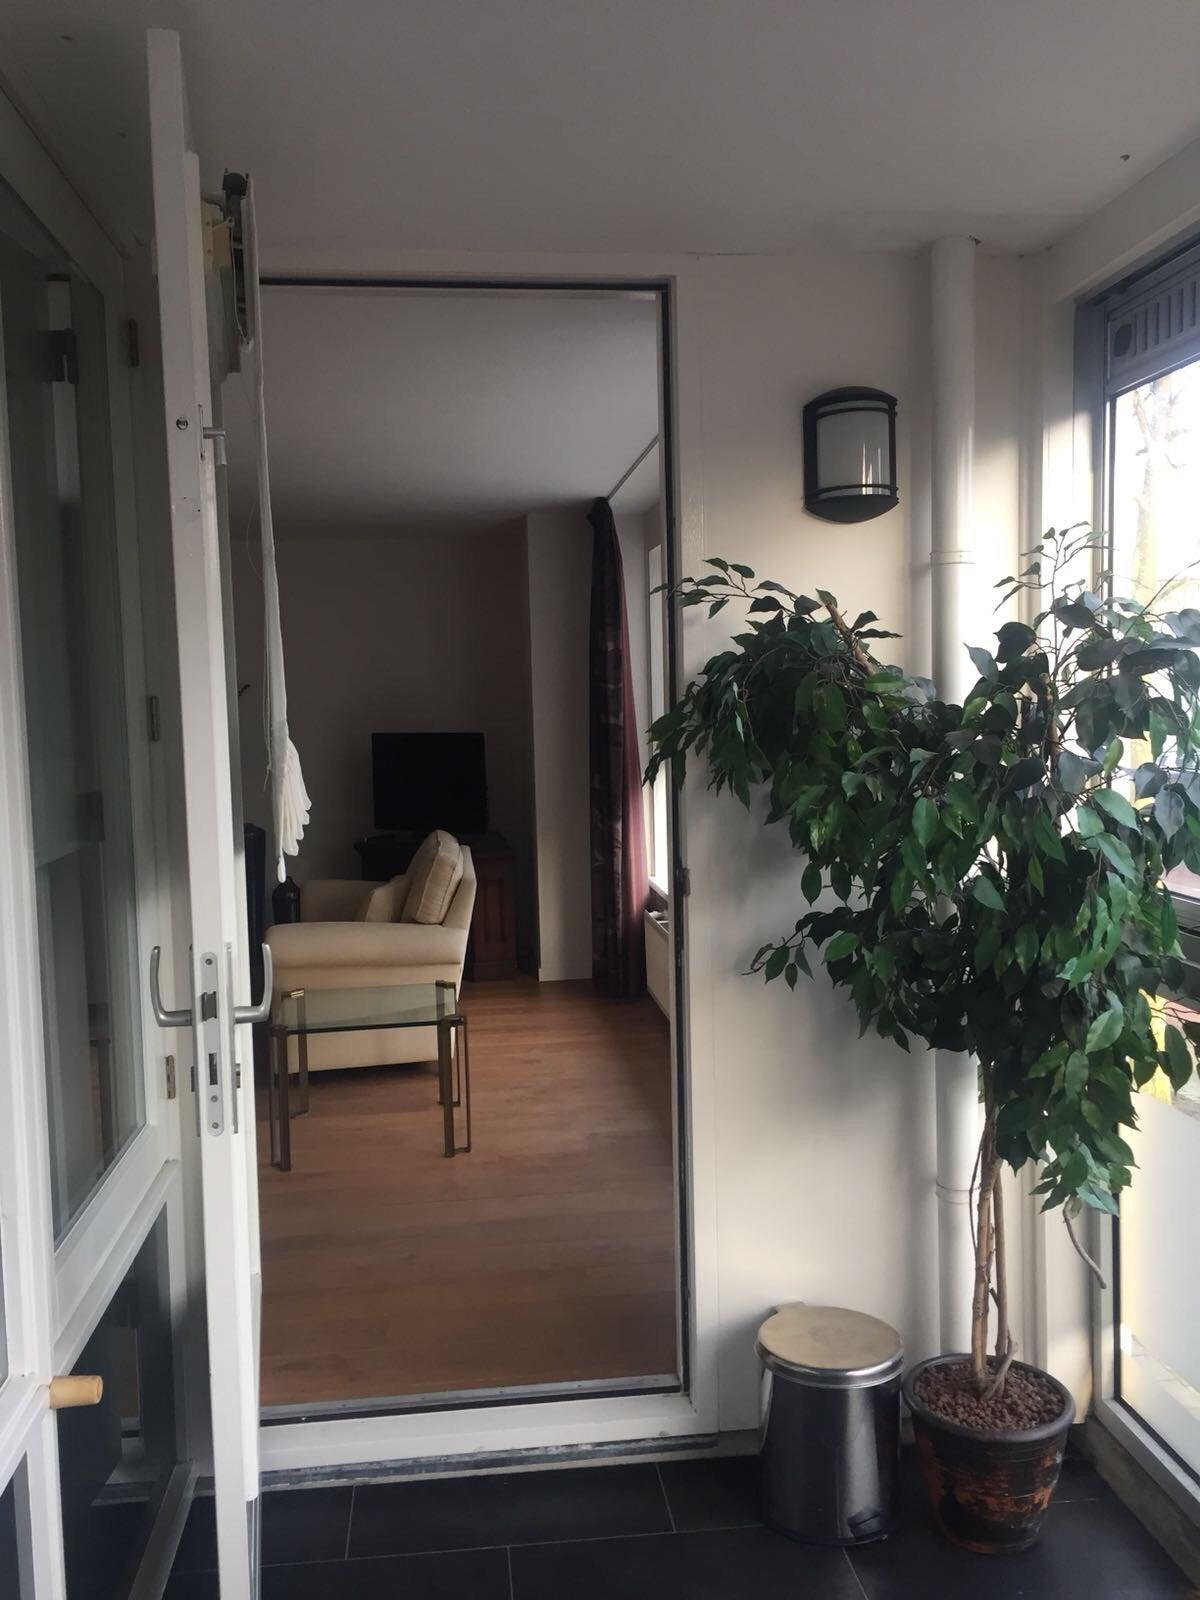 https://public.parariusoffice.nl/298/photos/huge/51563729.1518087843-403.JPG